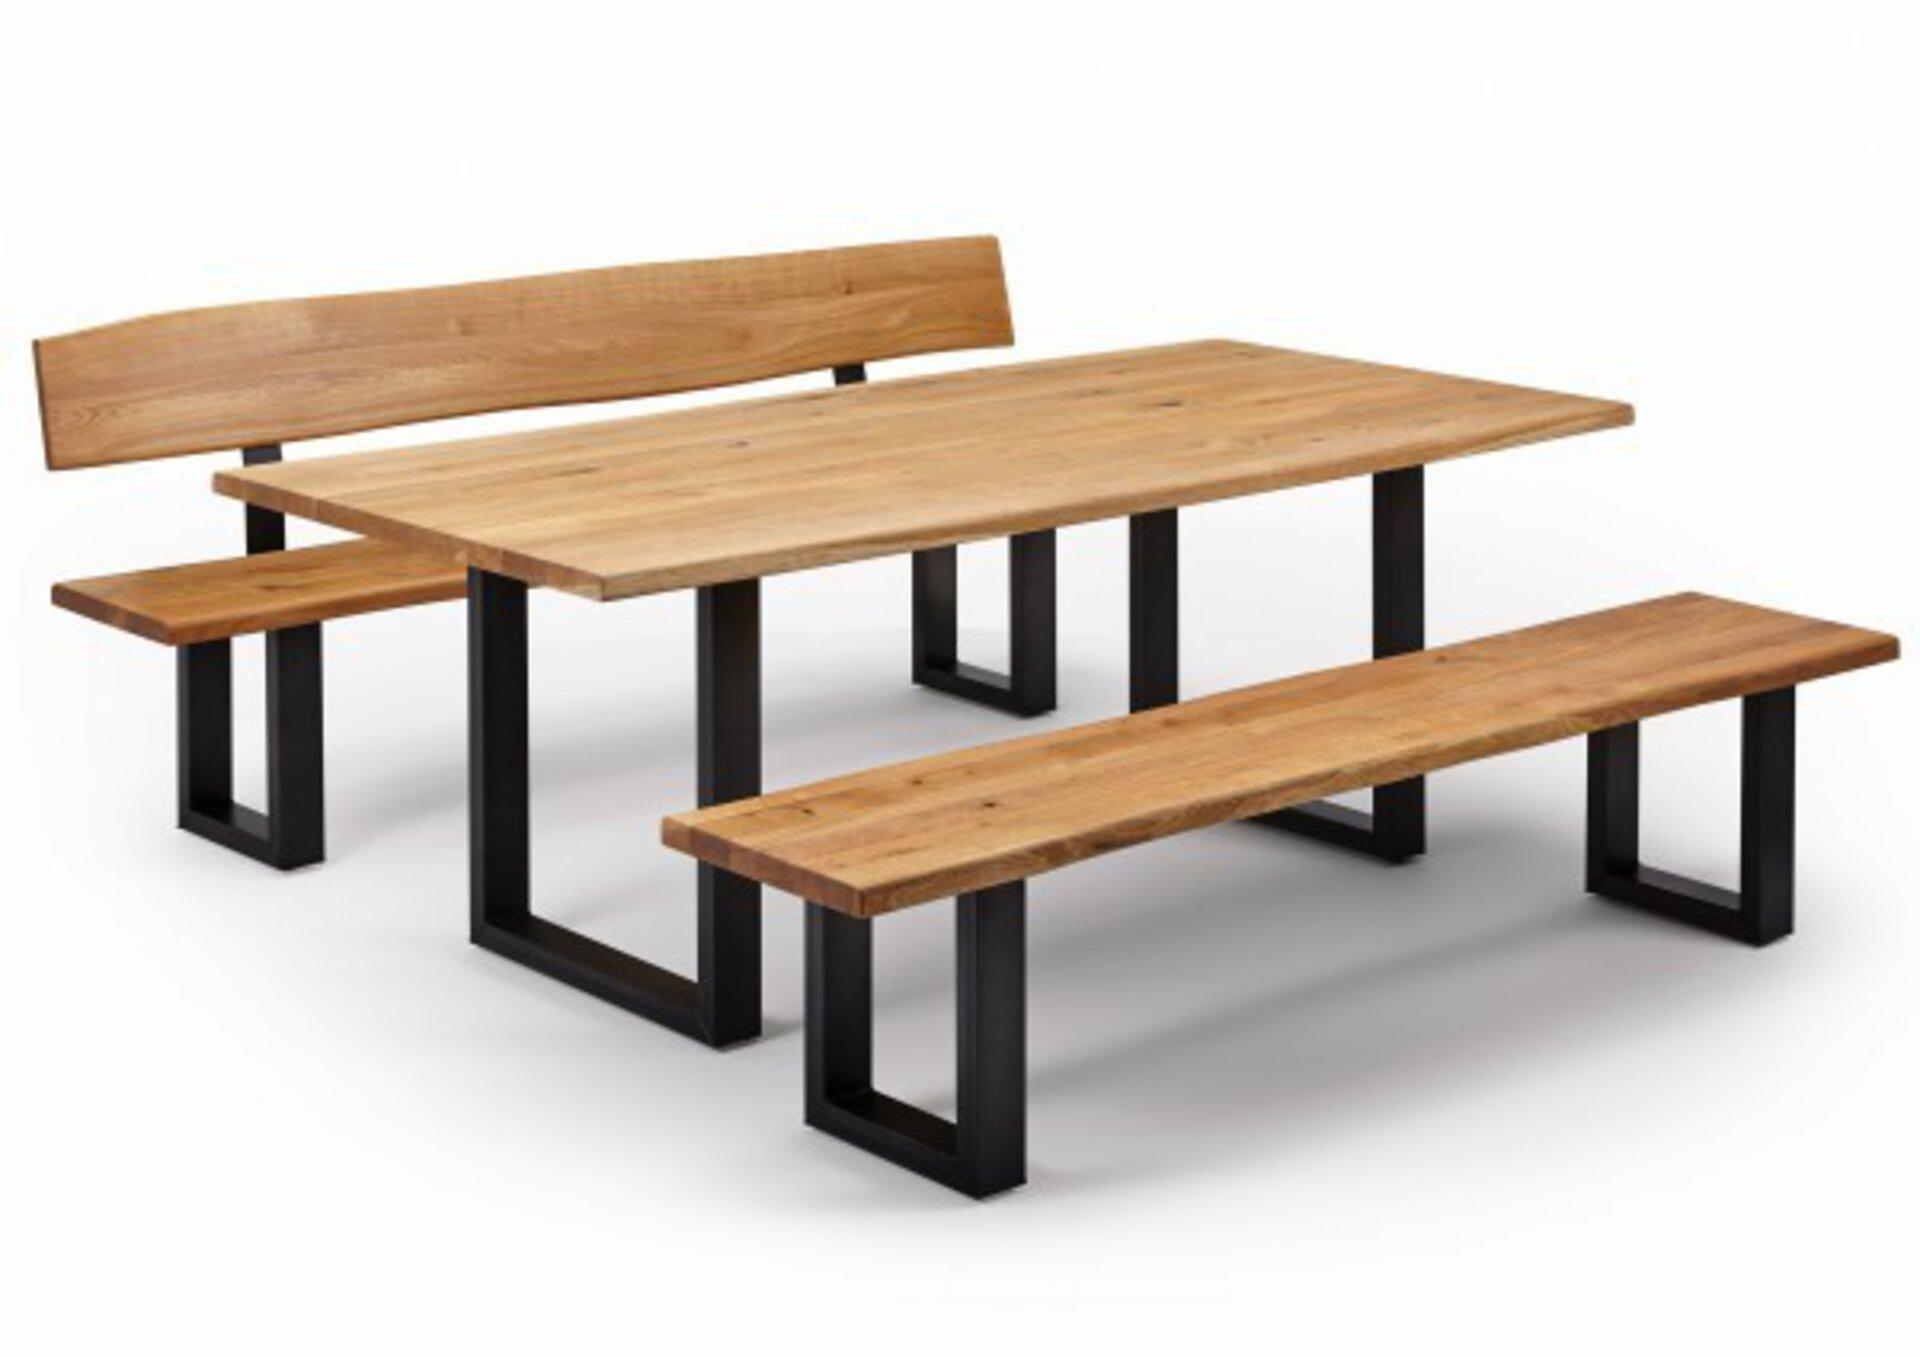 Tisch mit fester Platte ZINGST Dinett Metall 100 x 1 x 180 cm